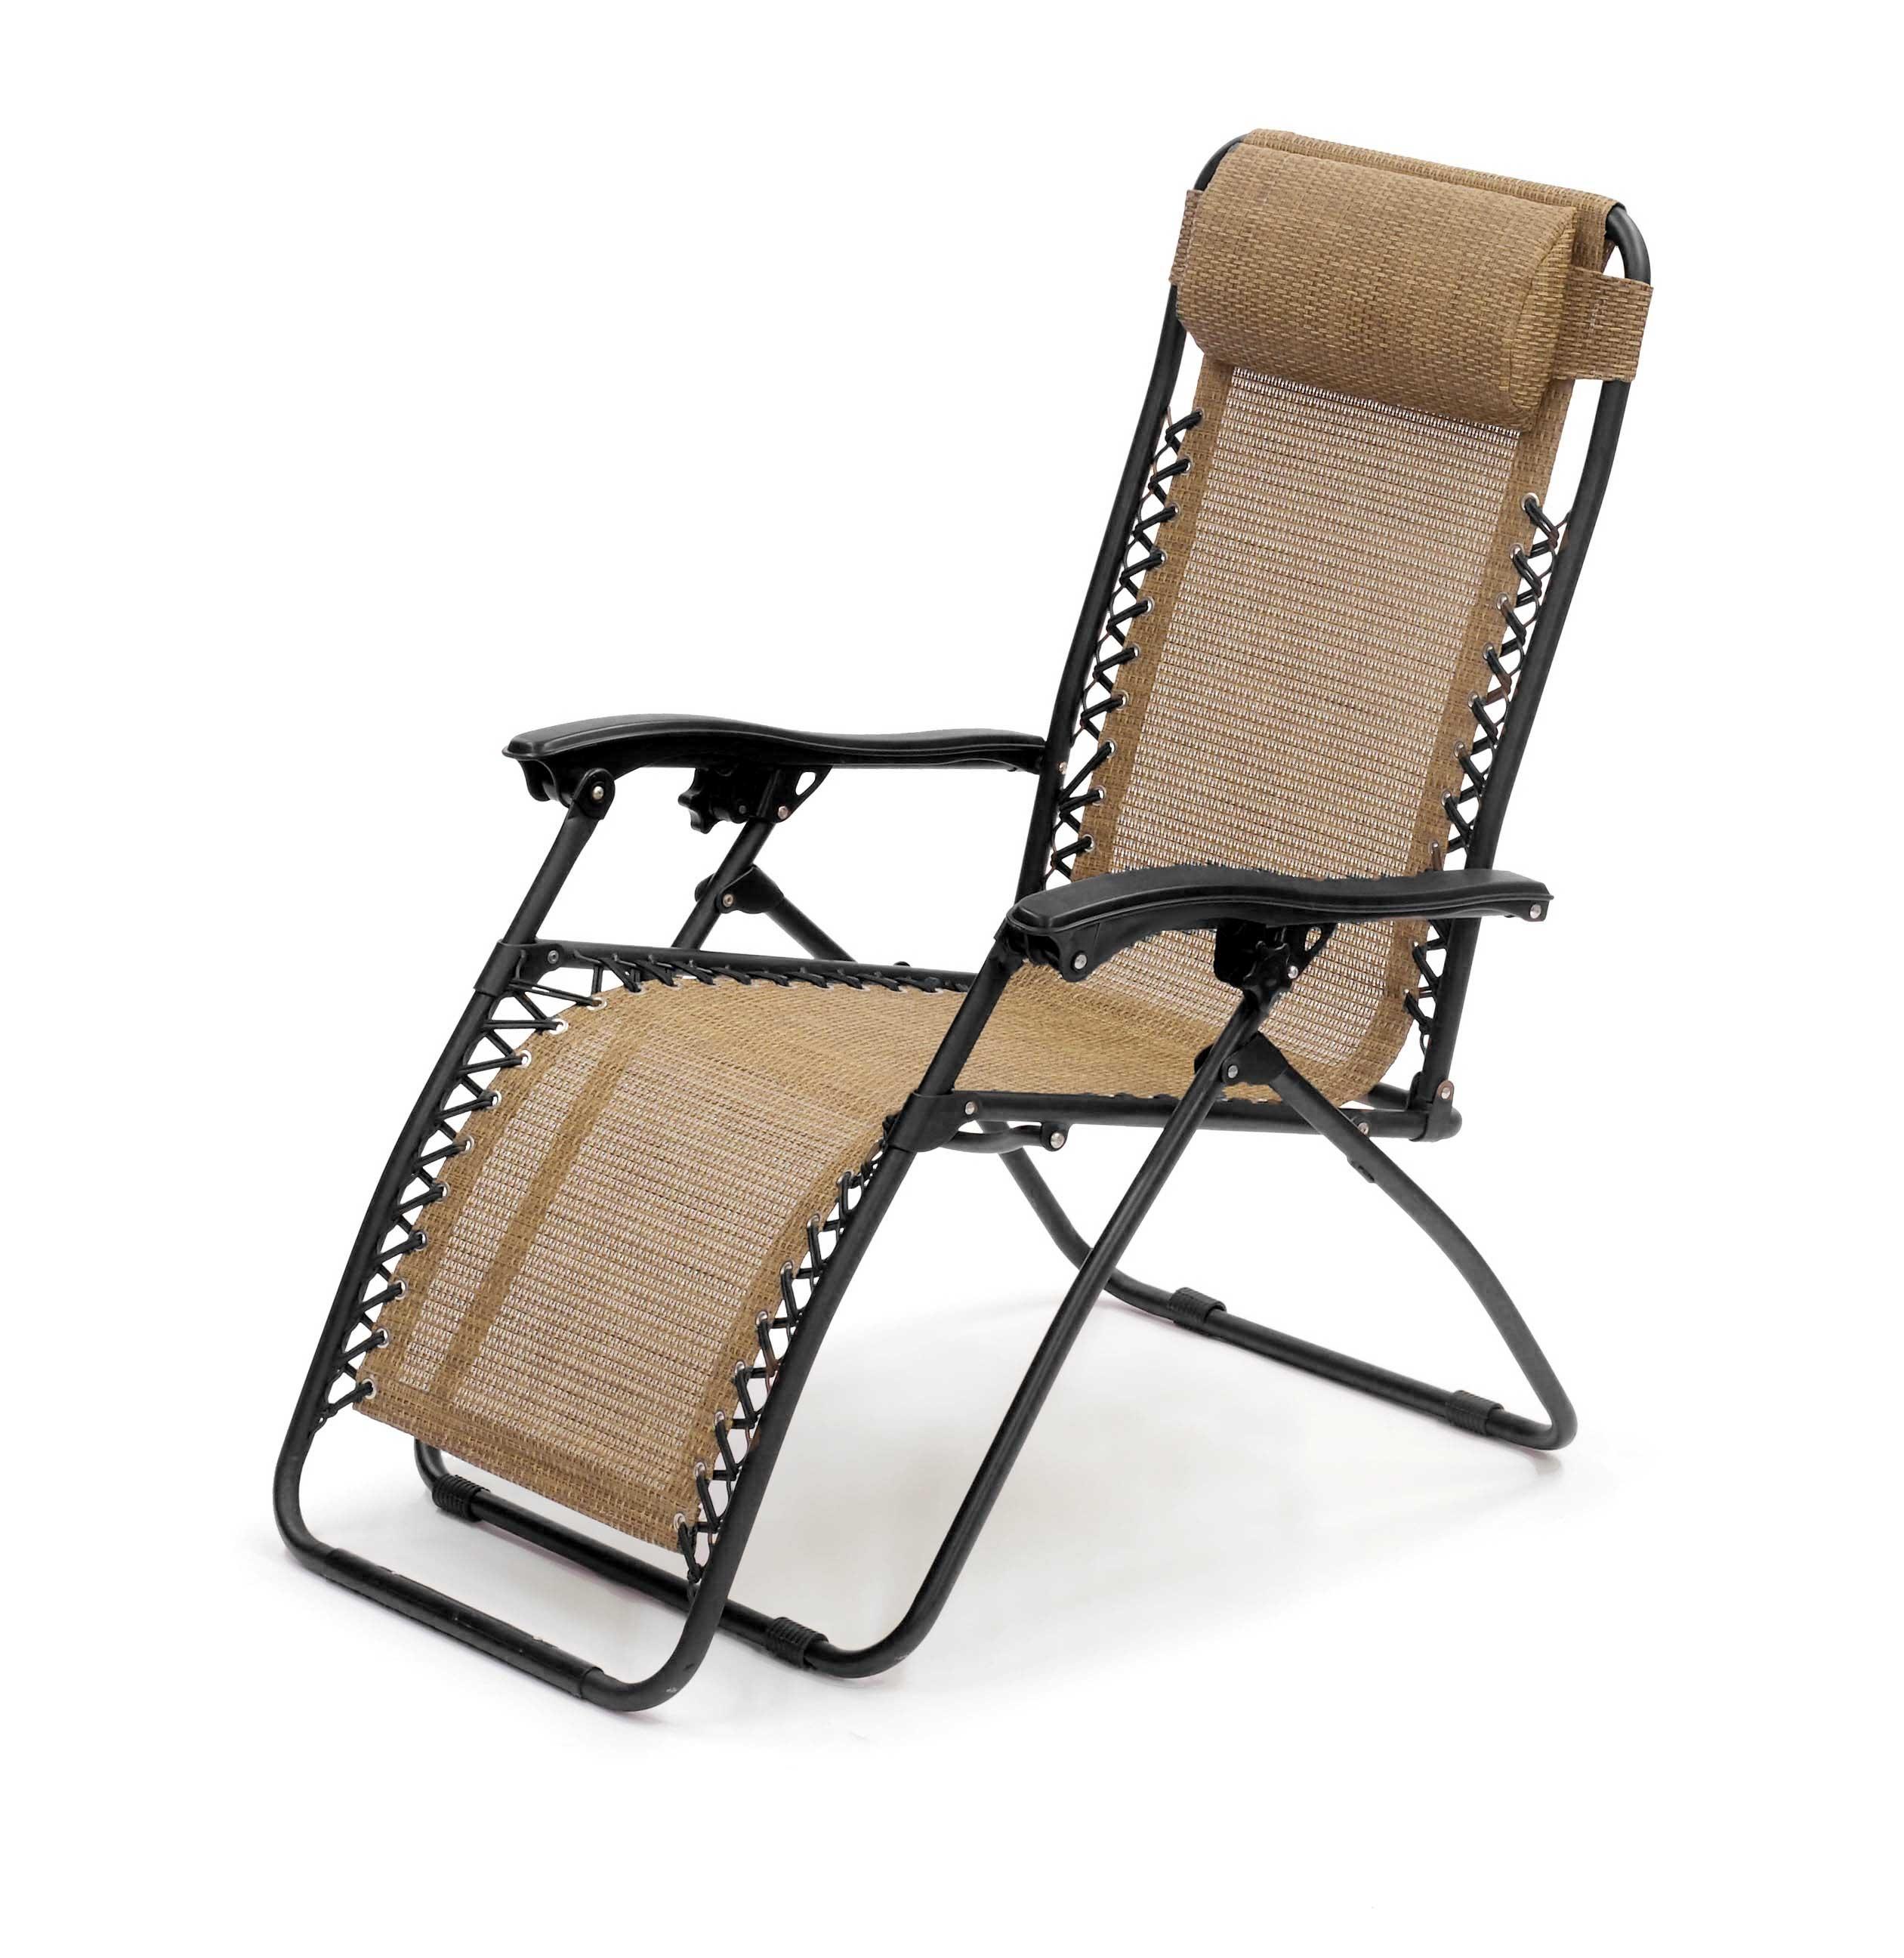 Suntime Deluxe Bronze Royale Gravity Garden Chair